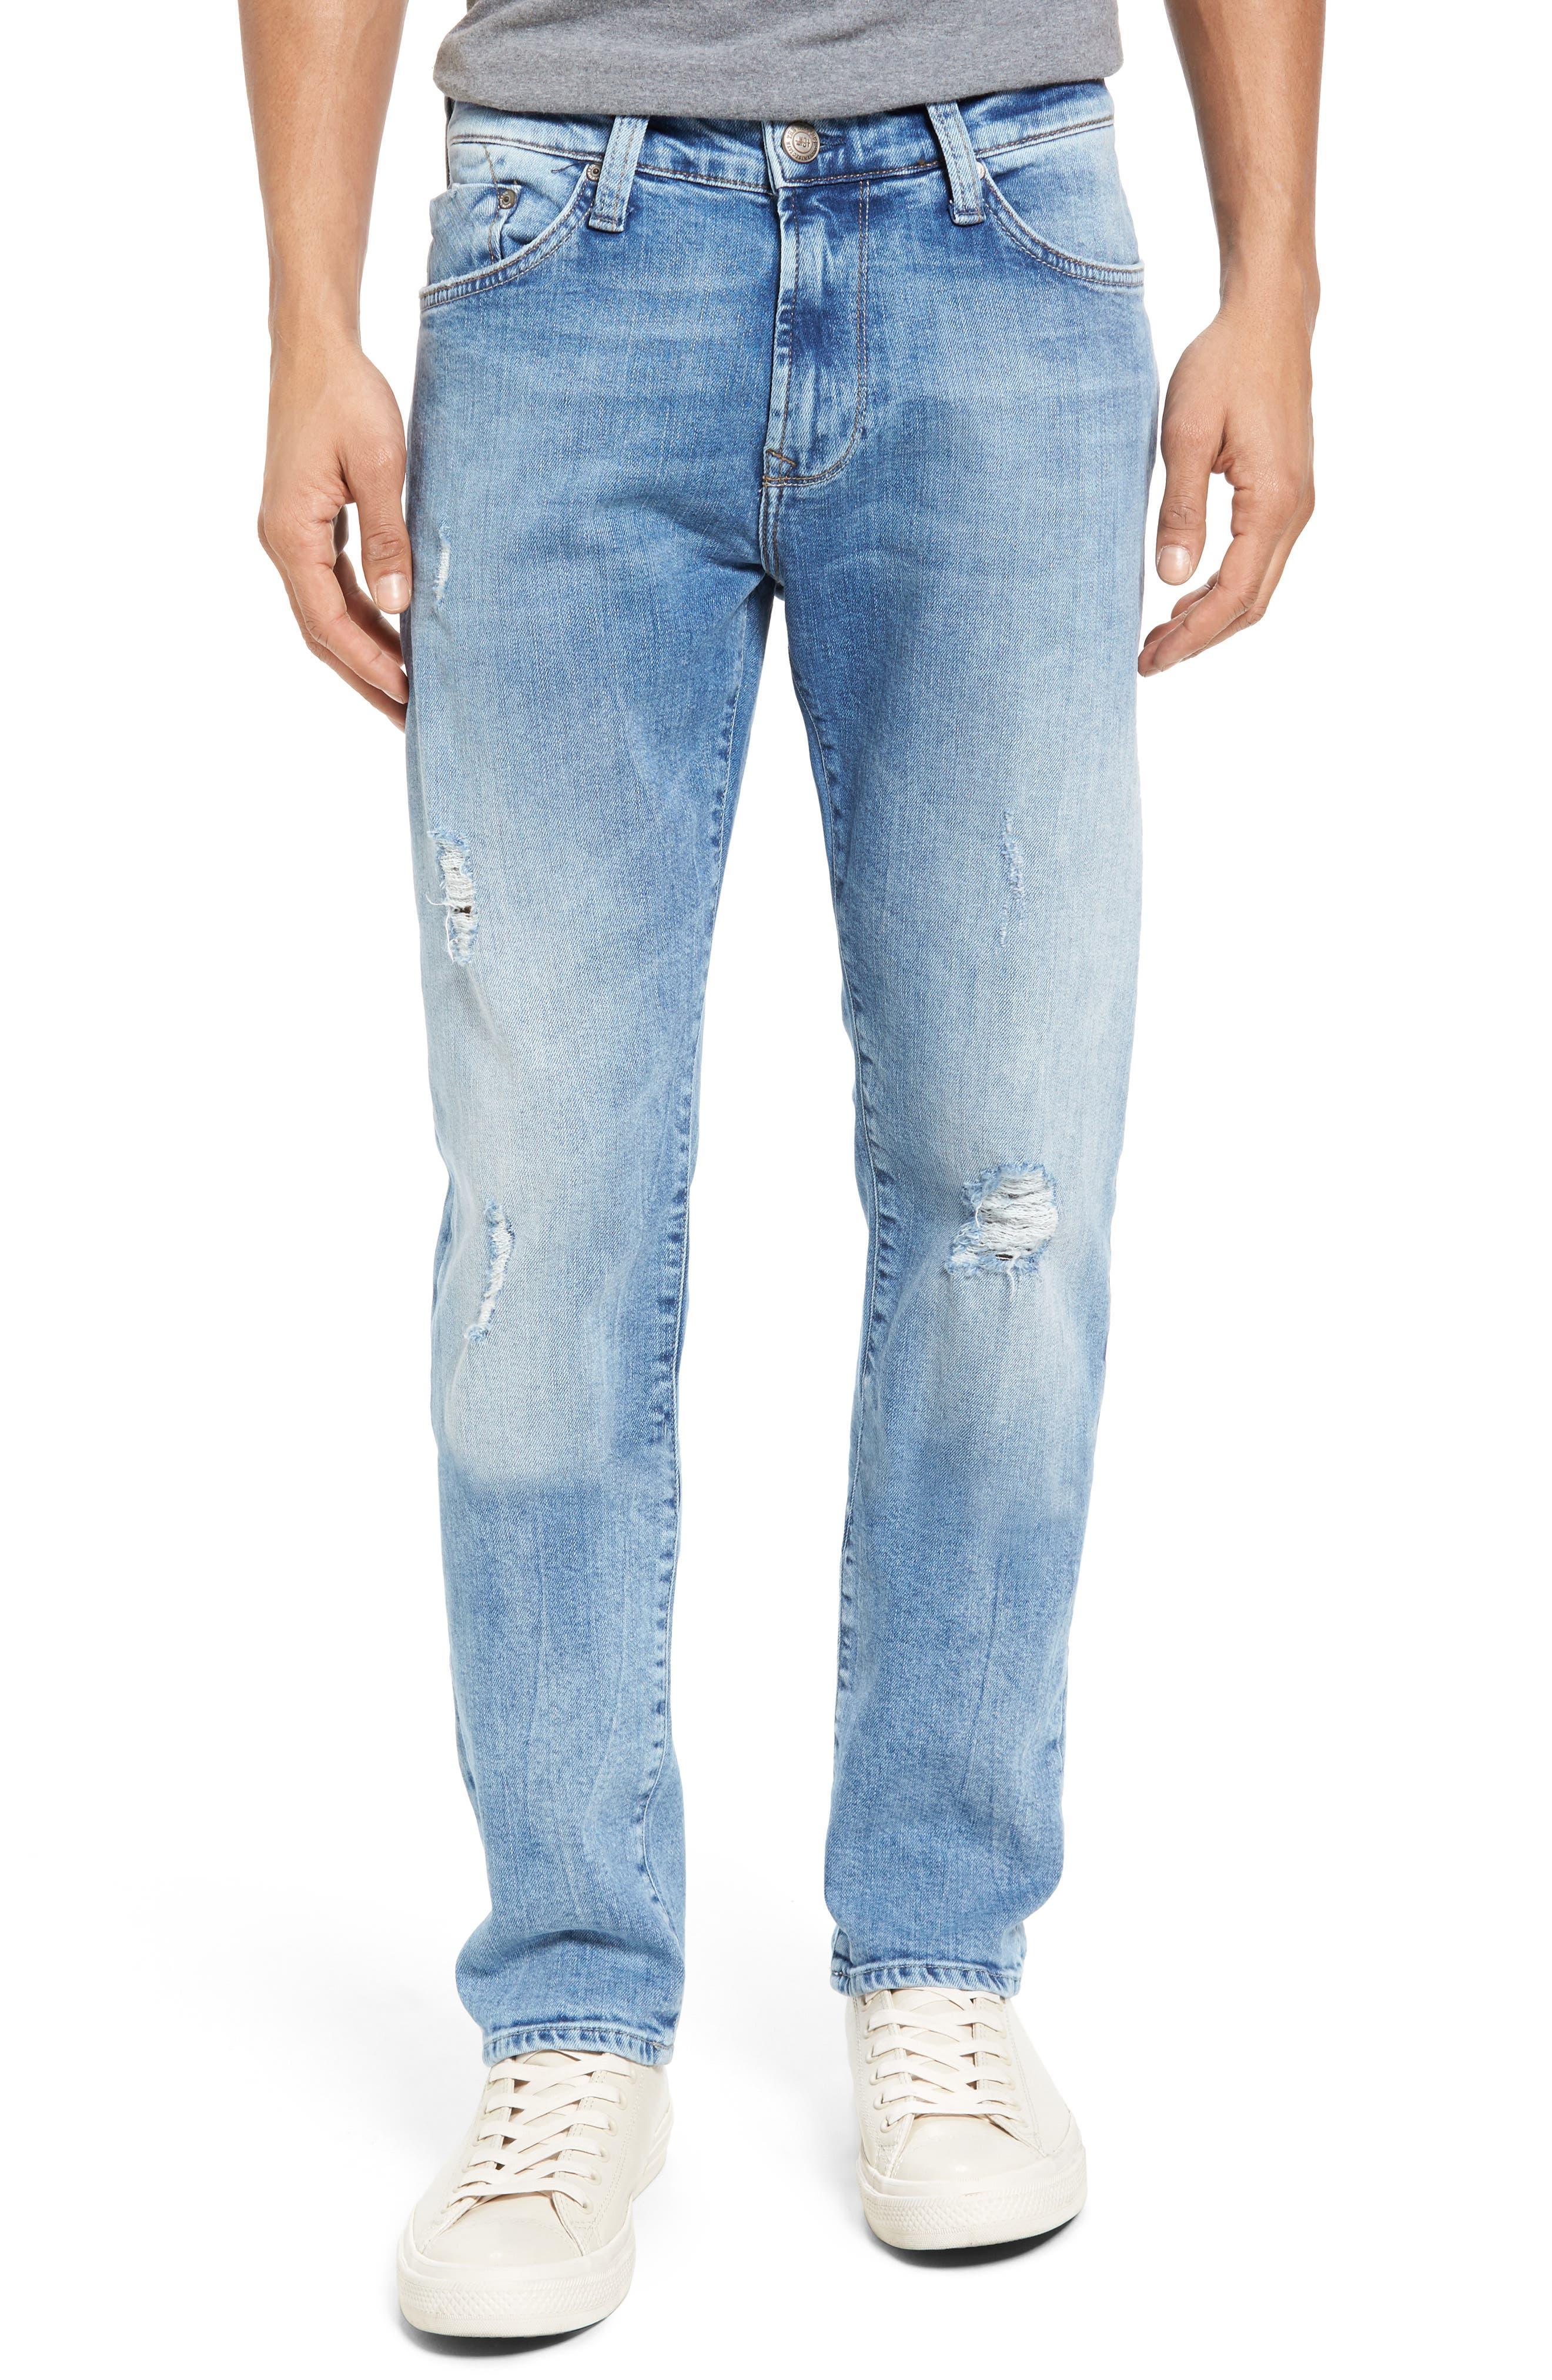 Main Image - Mavi Jeans Jake Easy Slim Fit Jeans (Ripped)